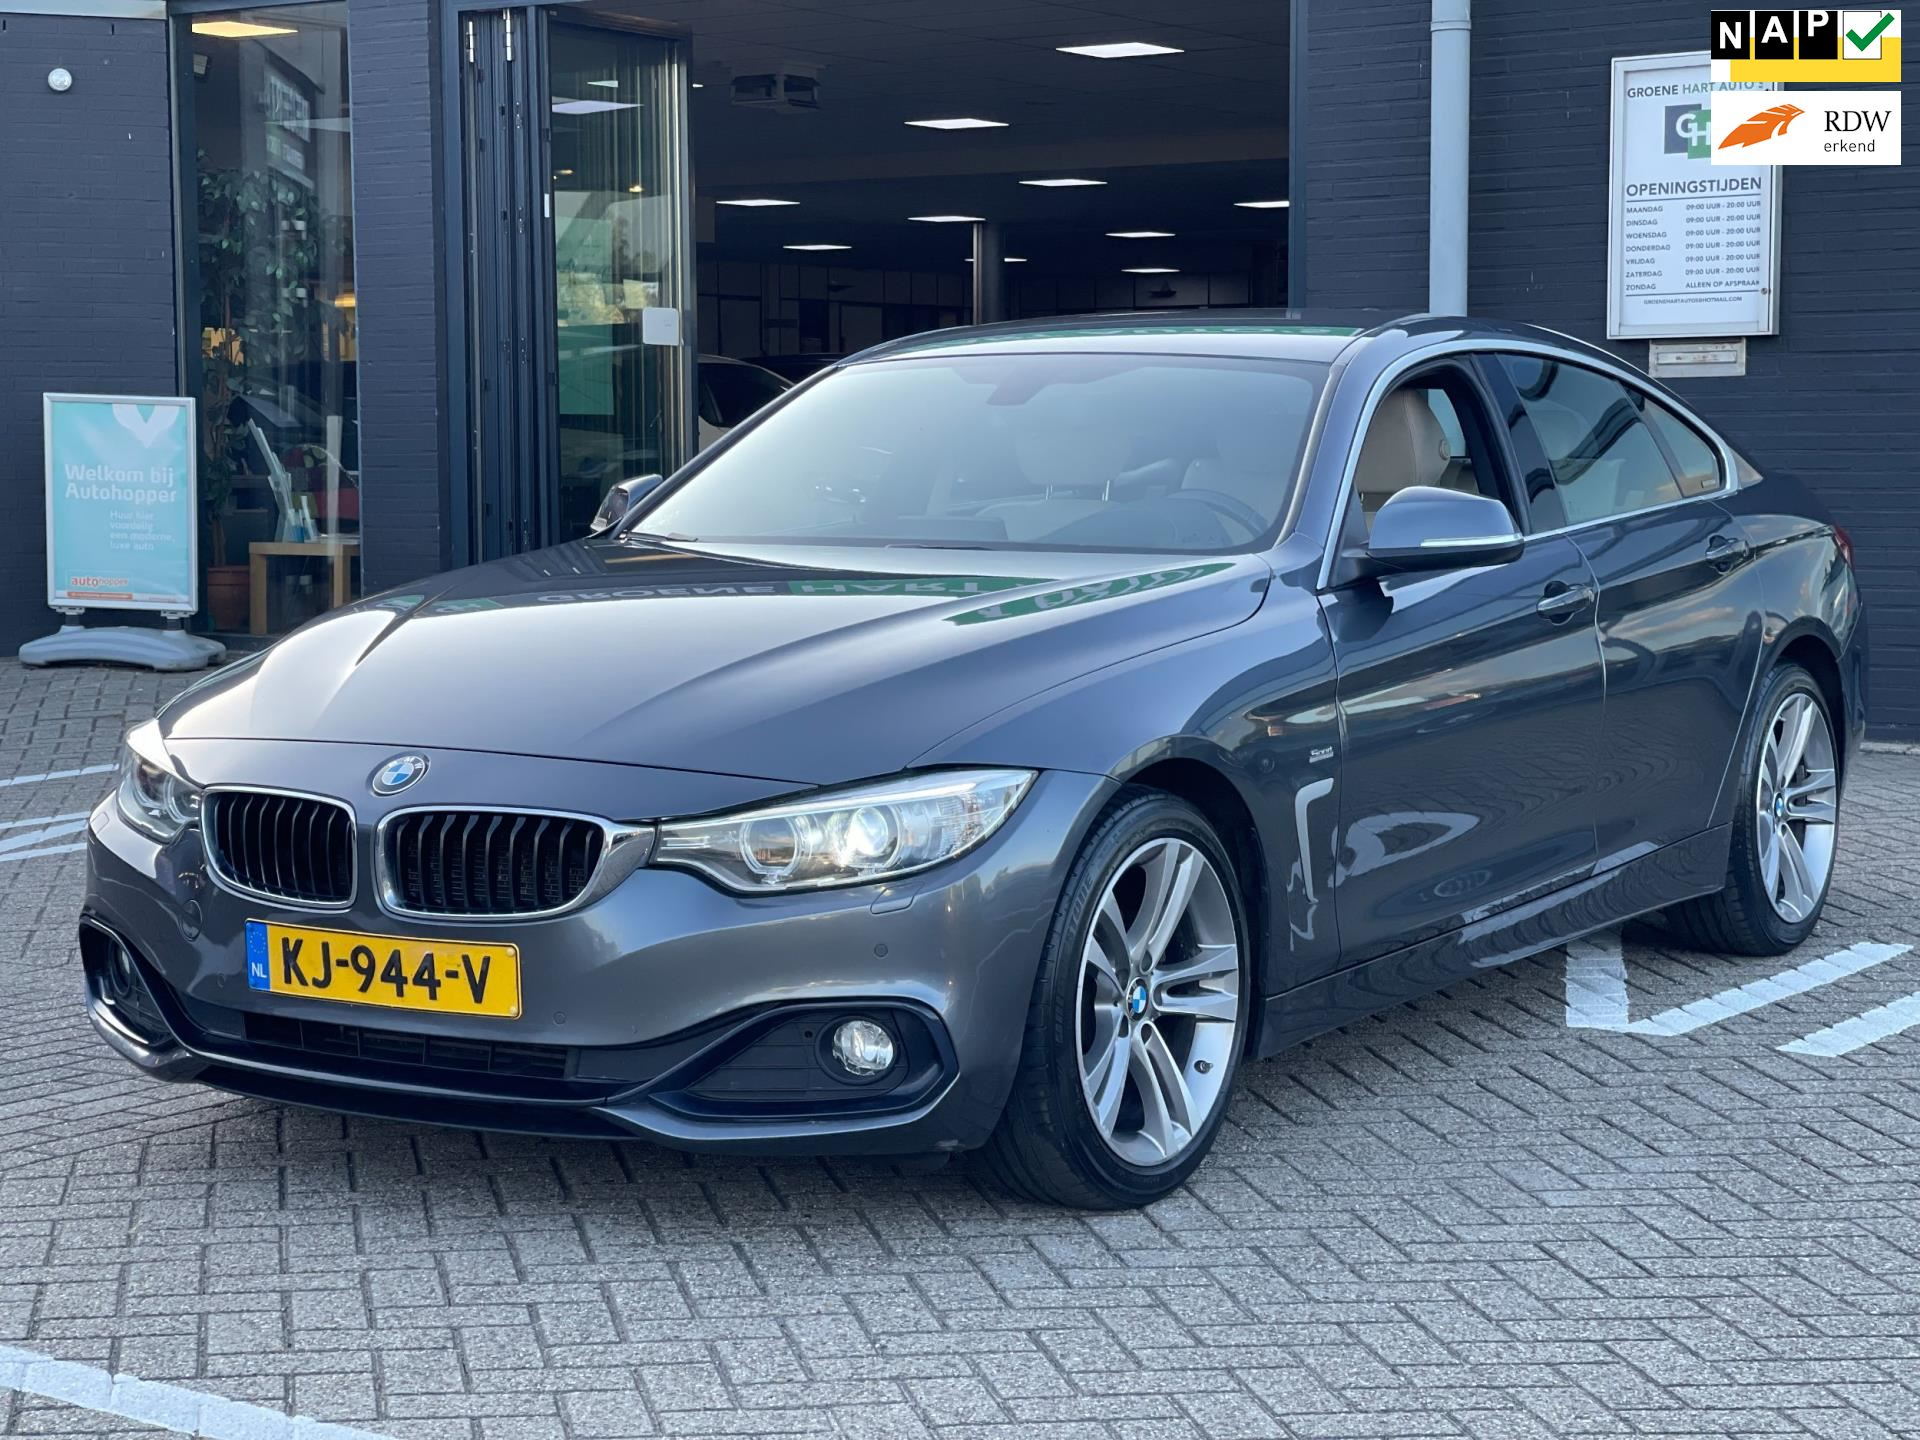 BMW 4-serie Gran Coupé occasion - Groene Hart Auto's